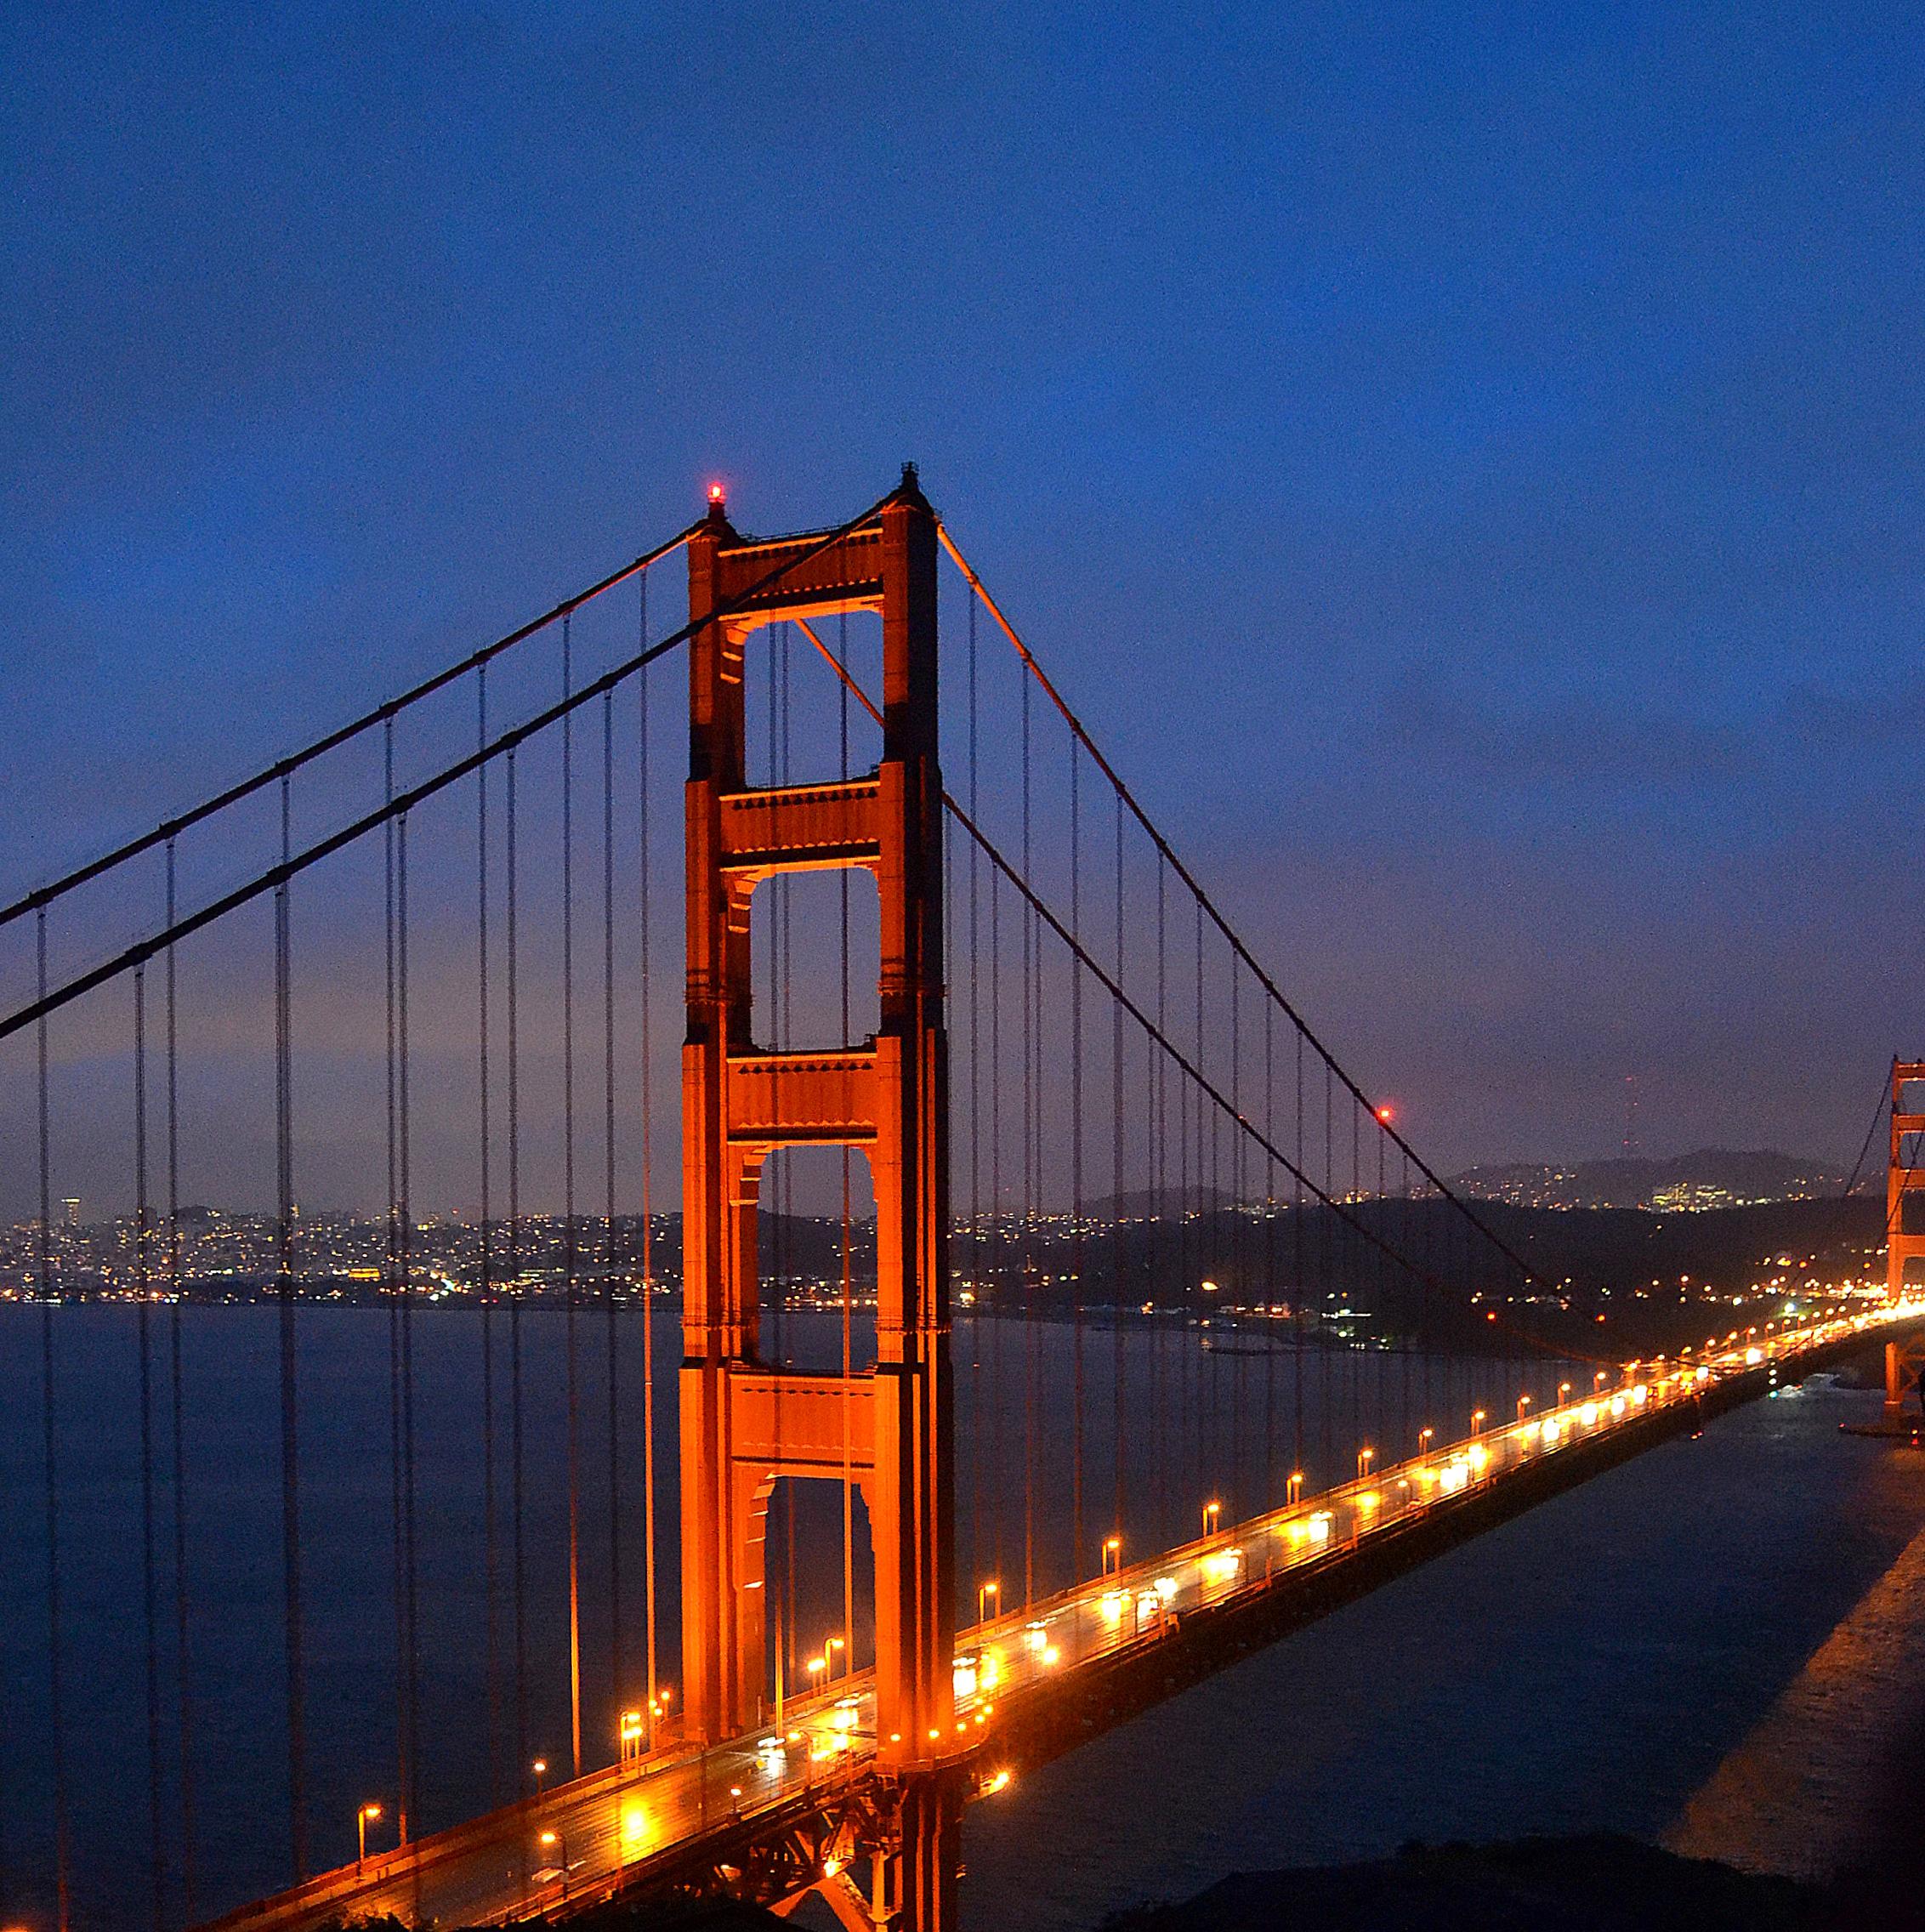 Good Wallpaper Night Golden Gate Bridge - Golden_Gate_Bridge_at_Night_%28pfnatic%29  You Should Have-509557.JPG